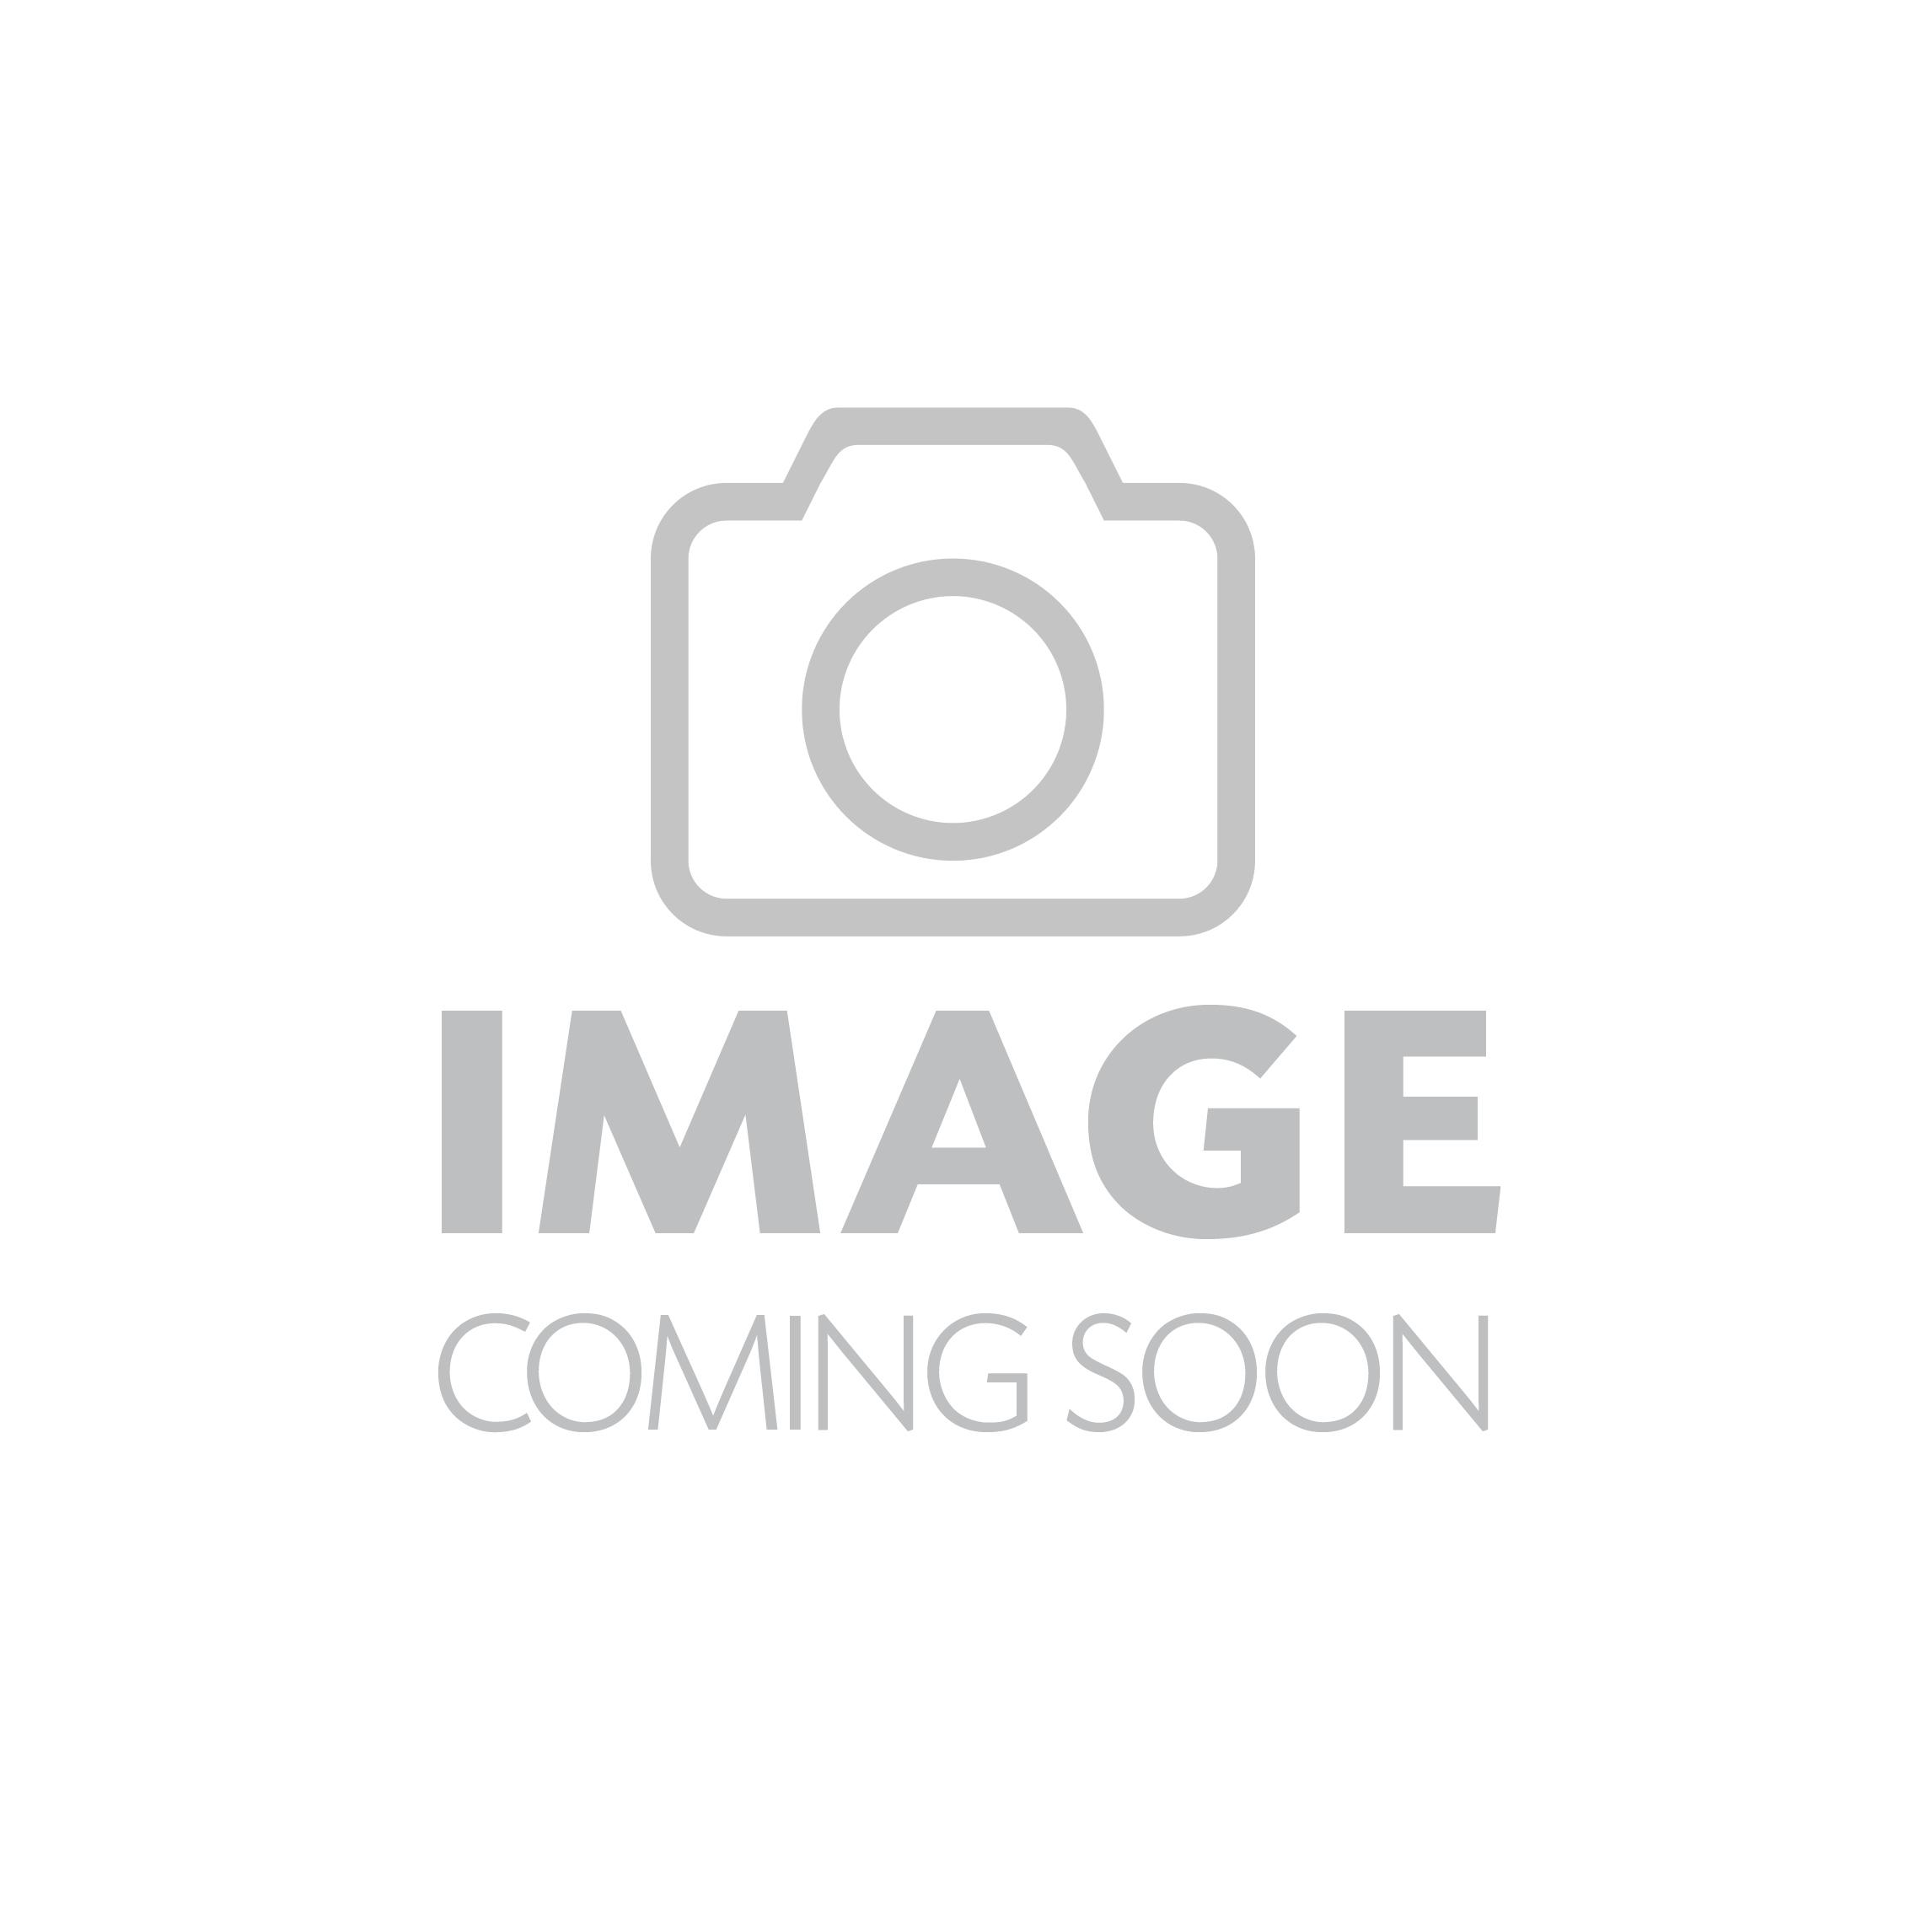 Broag S58685 Gas Valve Combination Block